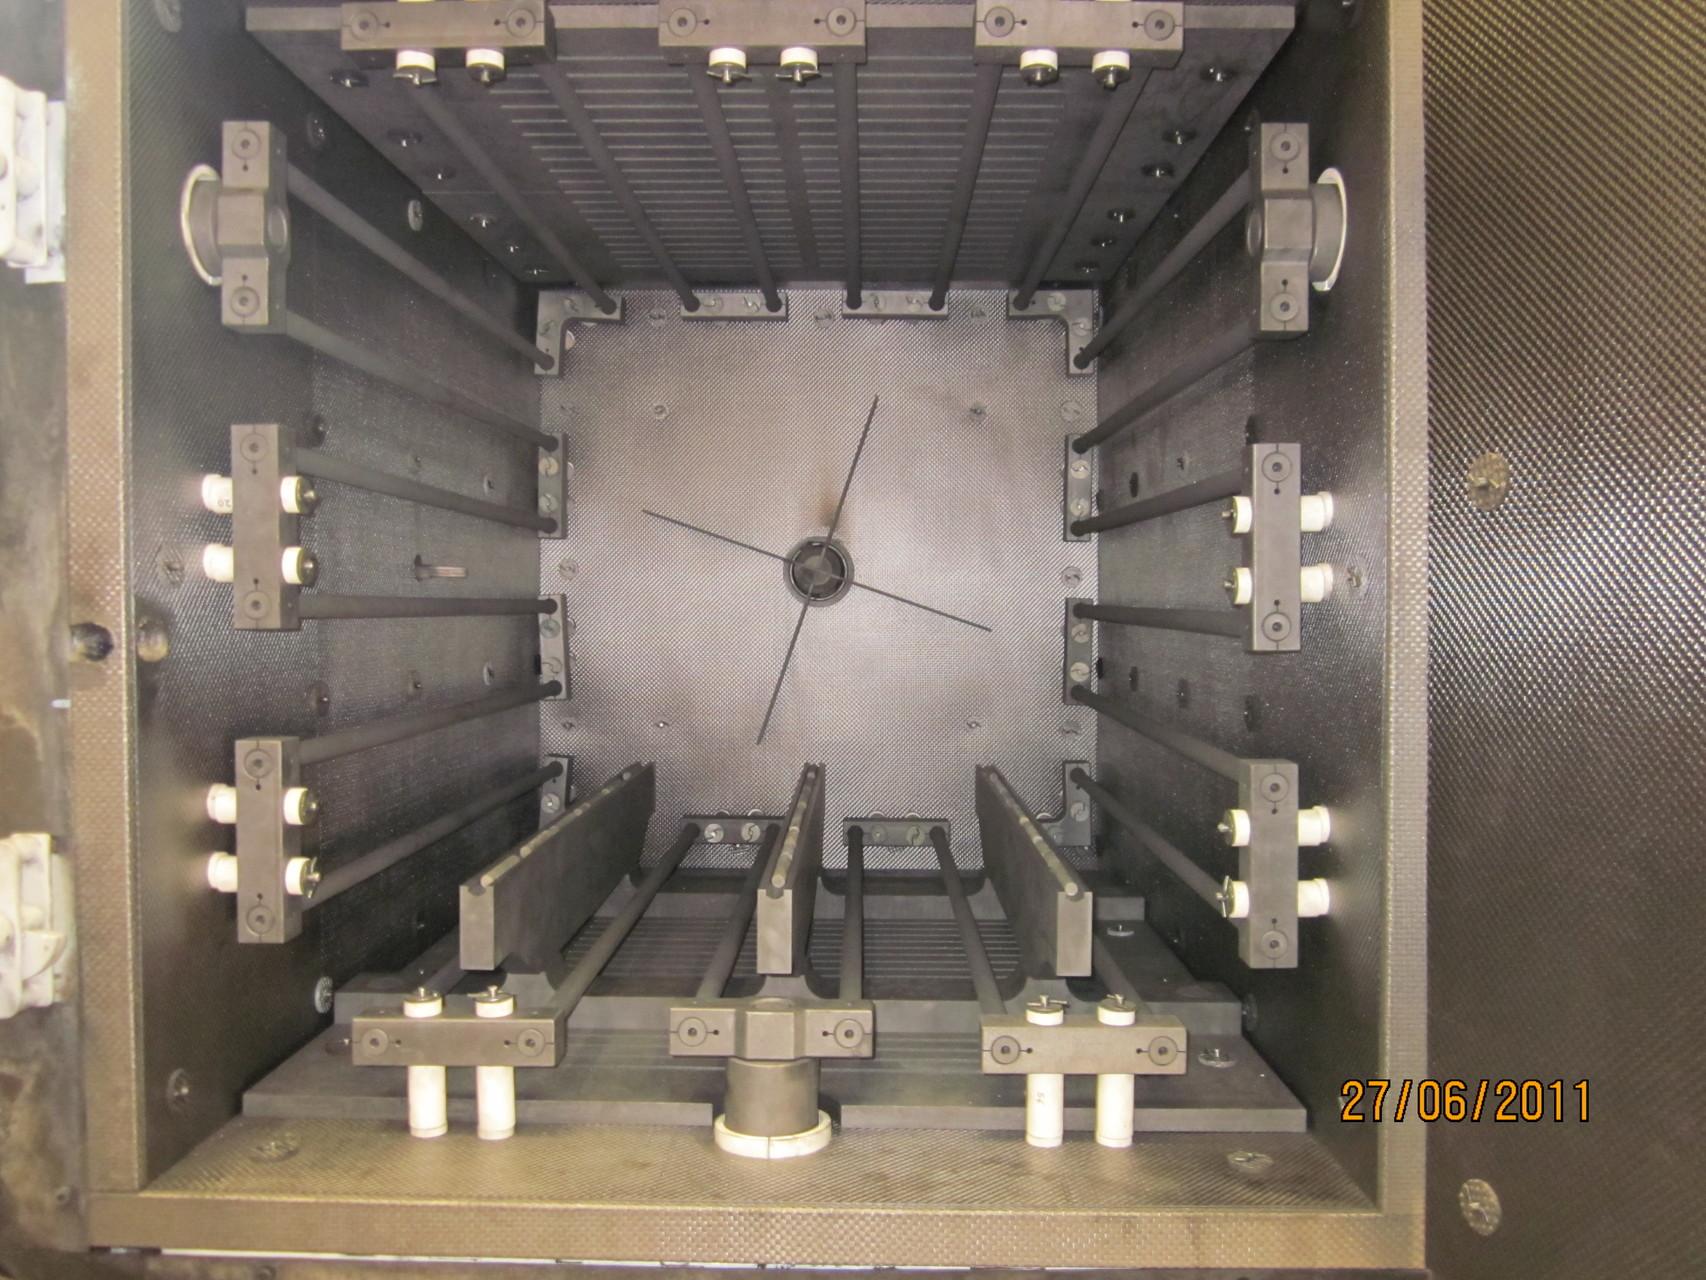 Vakuumheizkammer